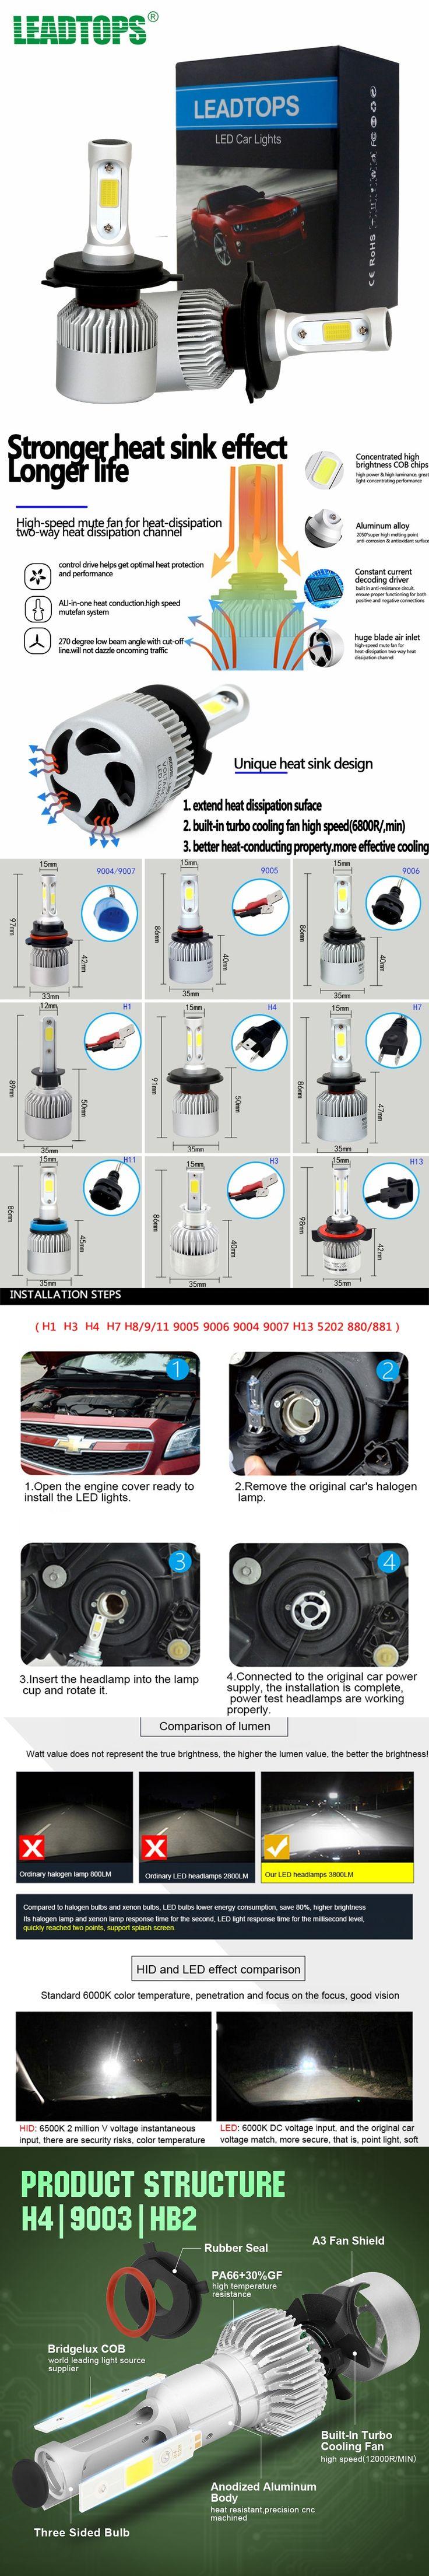 LEADTOPS H11 LED 9004/HB1 H4/9003/HB2 Car Headlight Bulb H3 H7 H1 LED 9005 Beam 72W 8000LM Auto Hi/Lo Car External Lights 12v CH